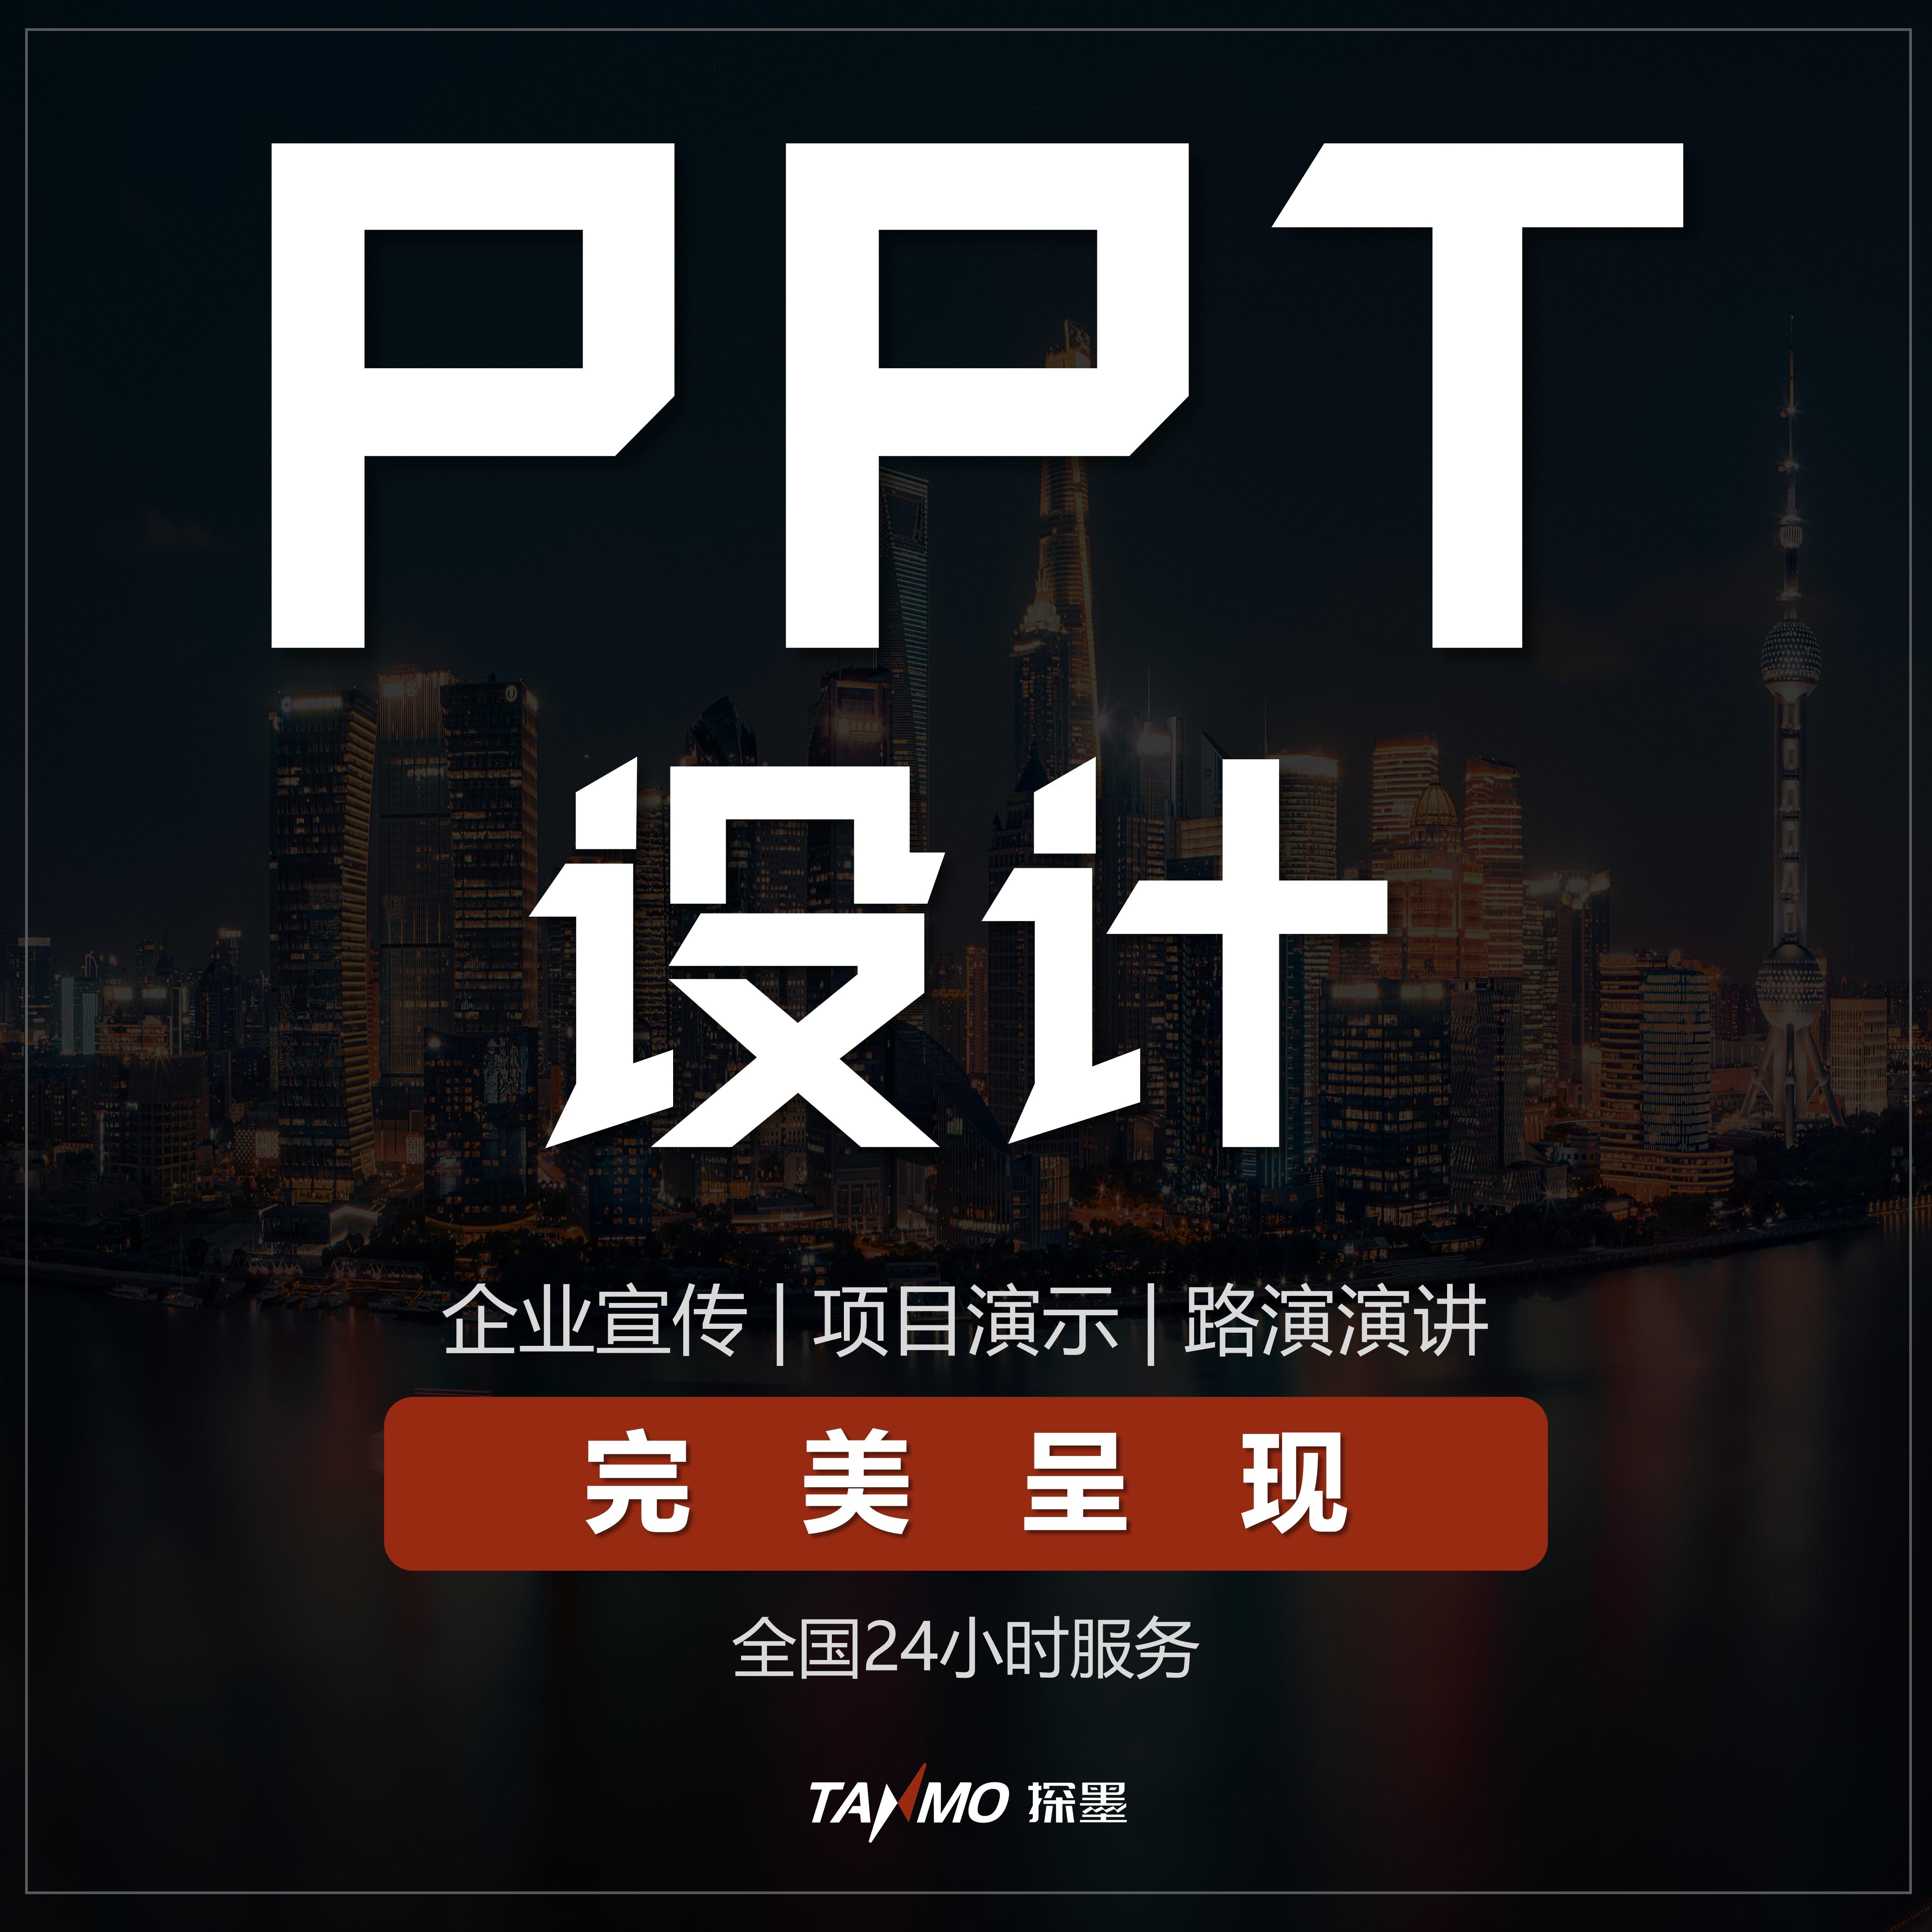 PPT设计制作美化招商汇报课件路演宣传发布会keynote